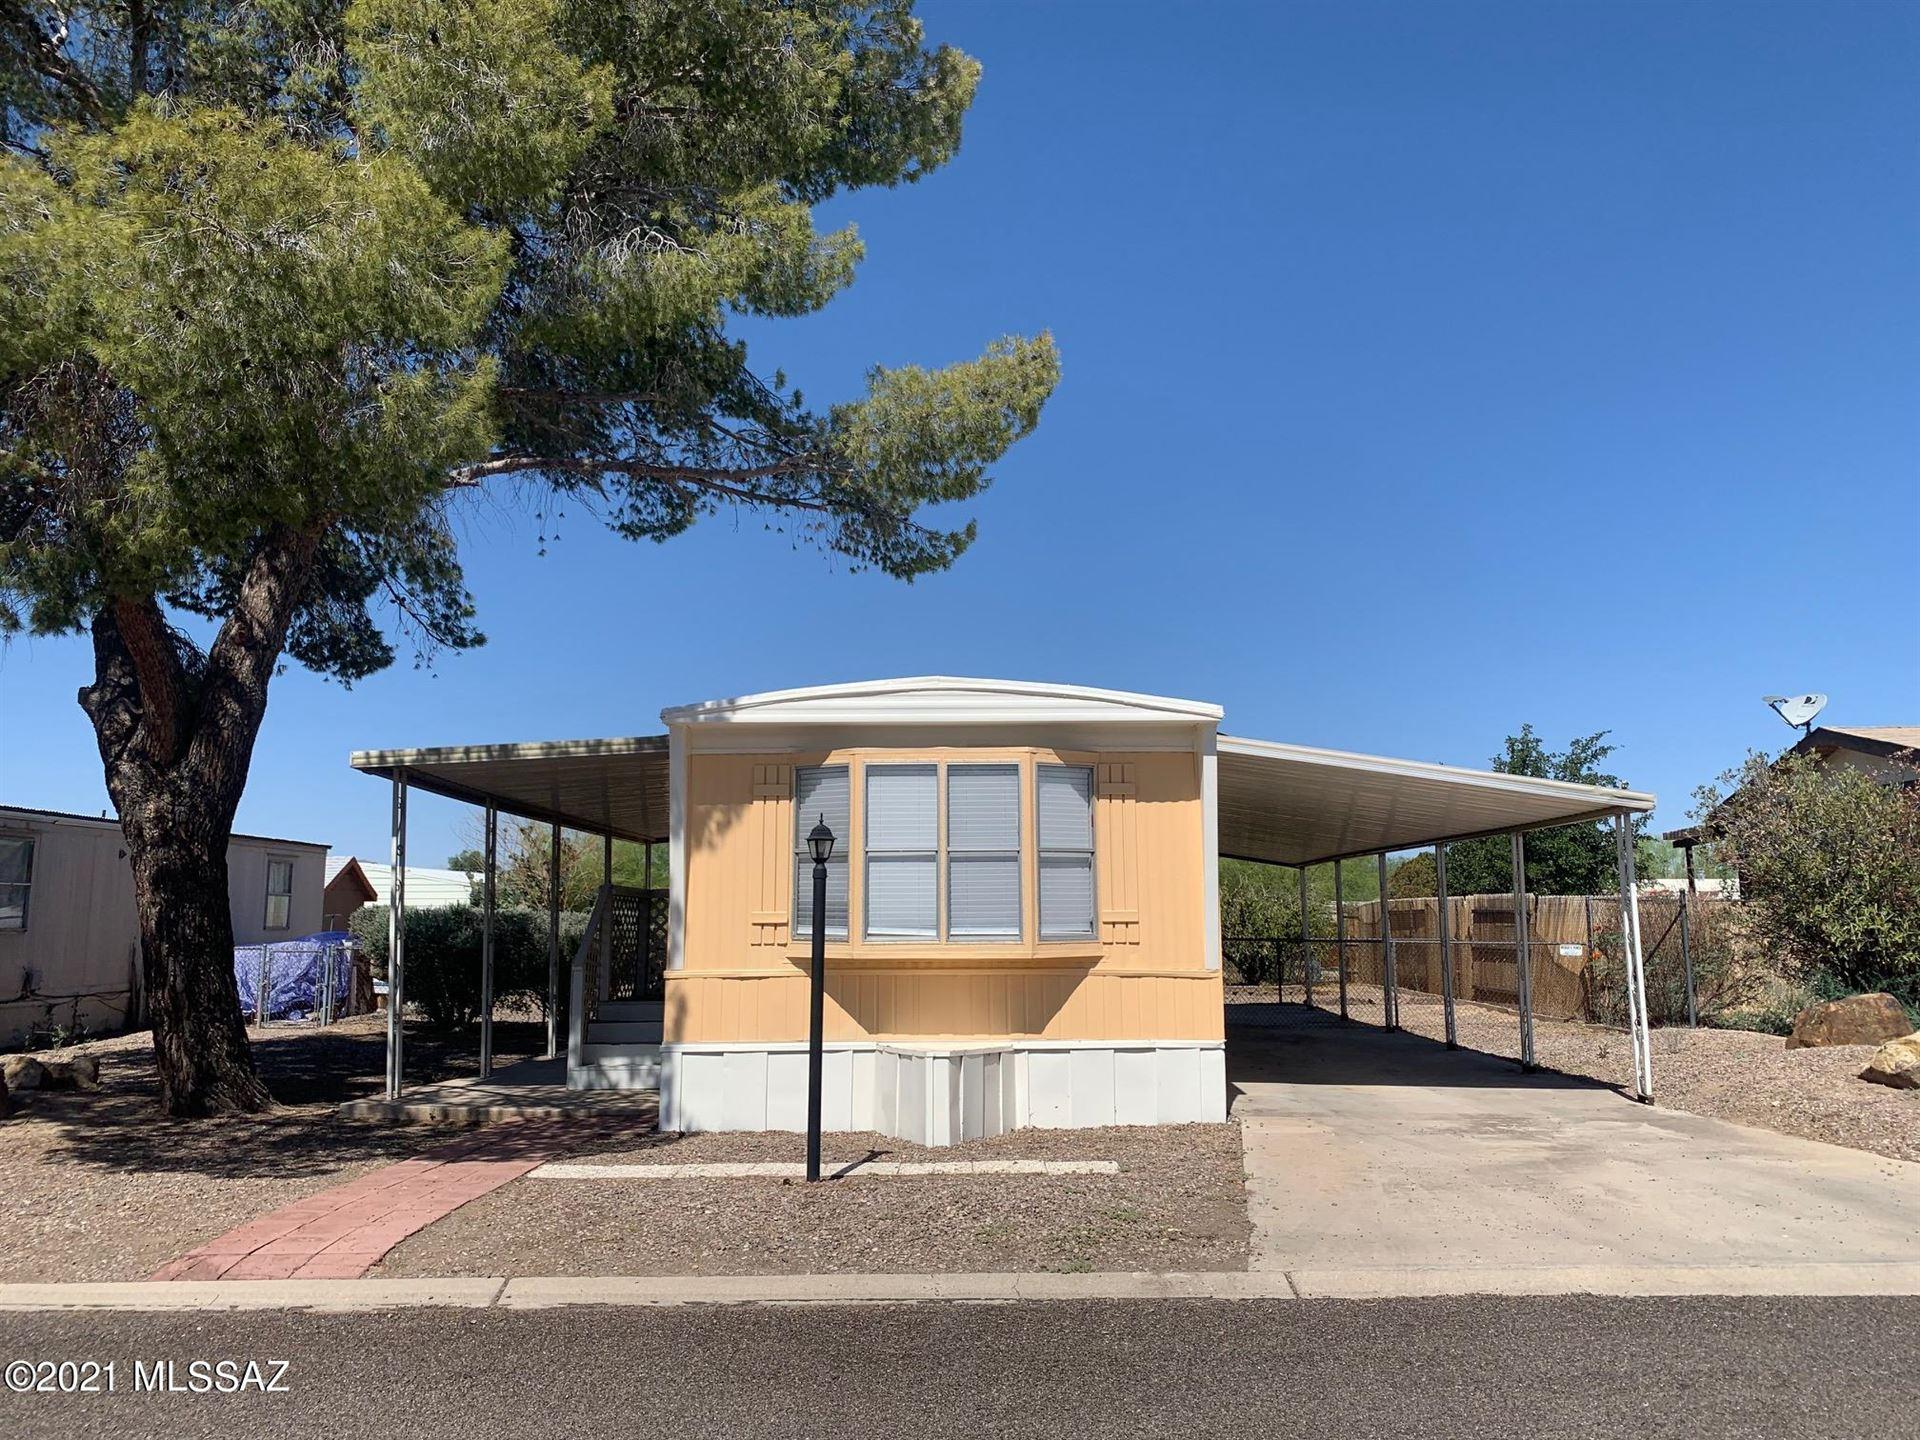 6341 N Lime Way, Tucson, AZ 85741 - MLS#: 22112647